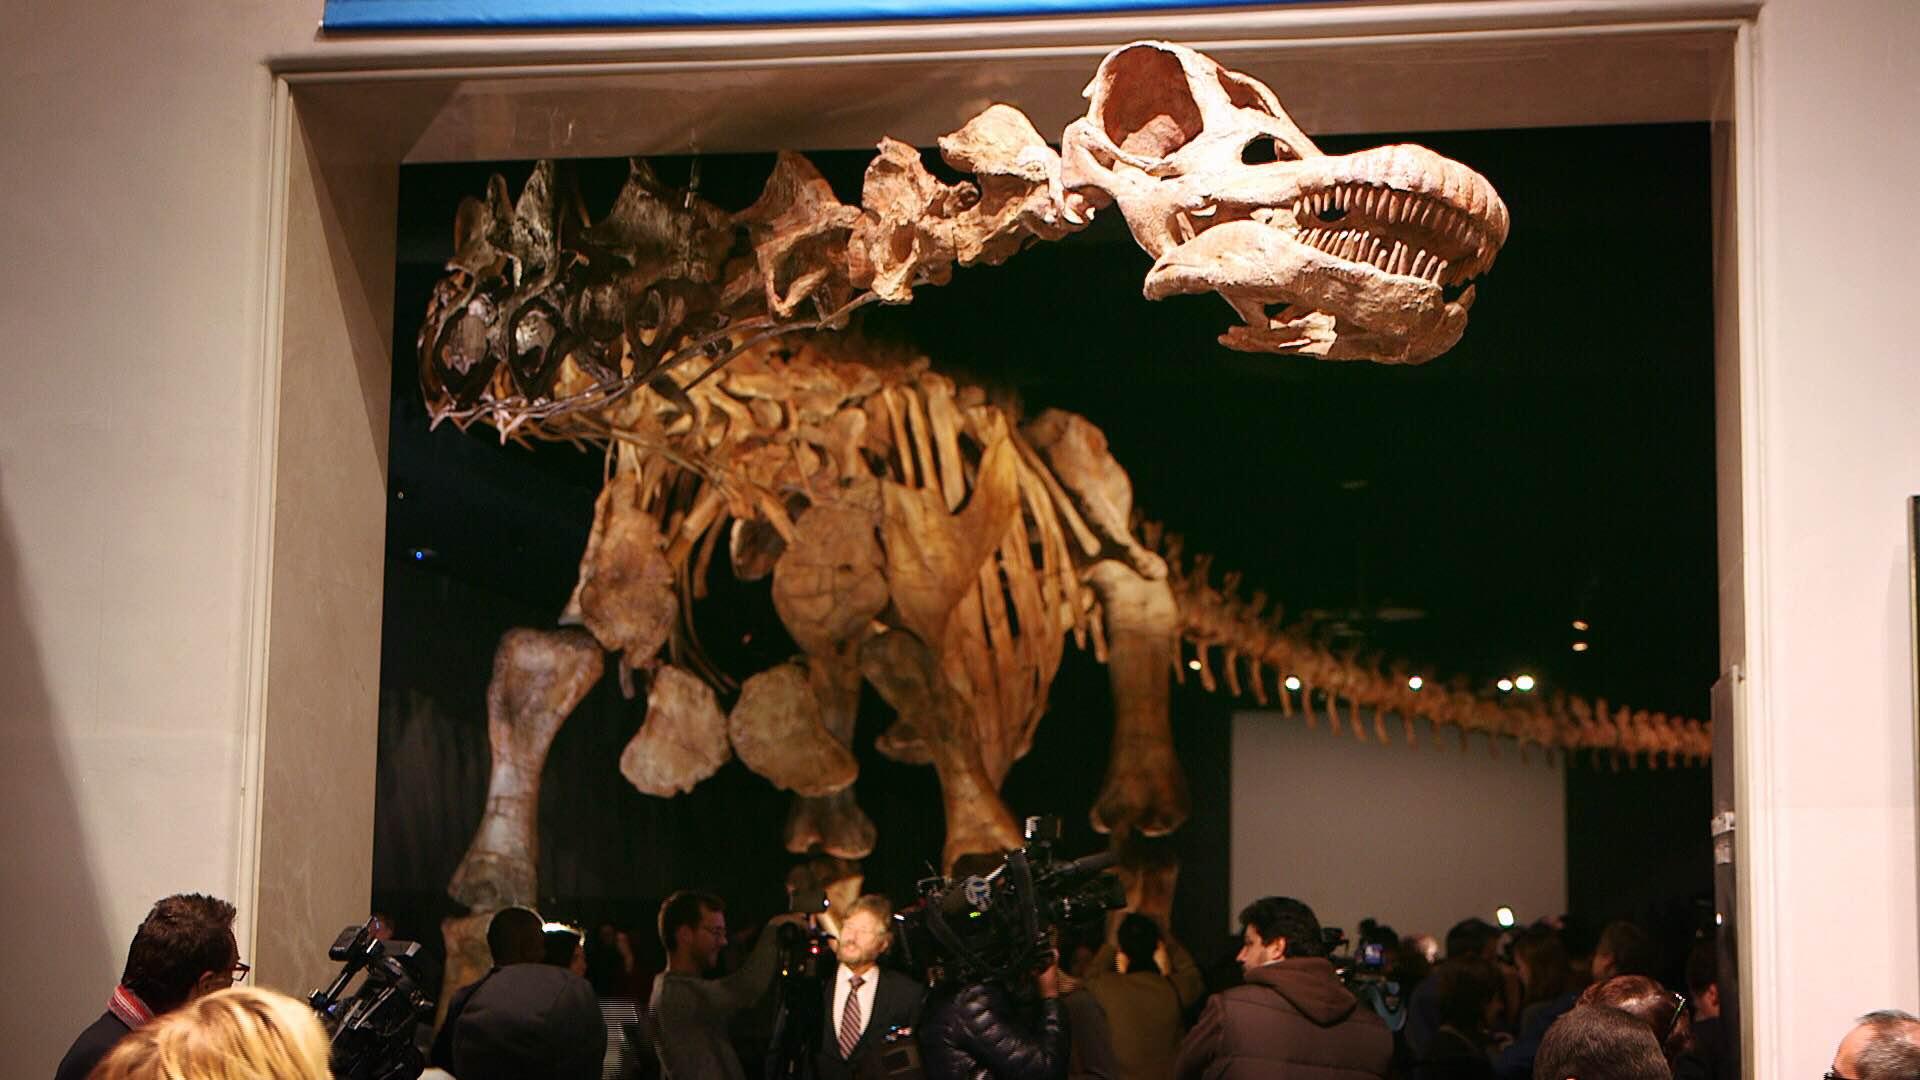 IMG 5088 New York City Crew Roars with Titanosaurus Rex at Museum